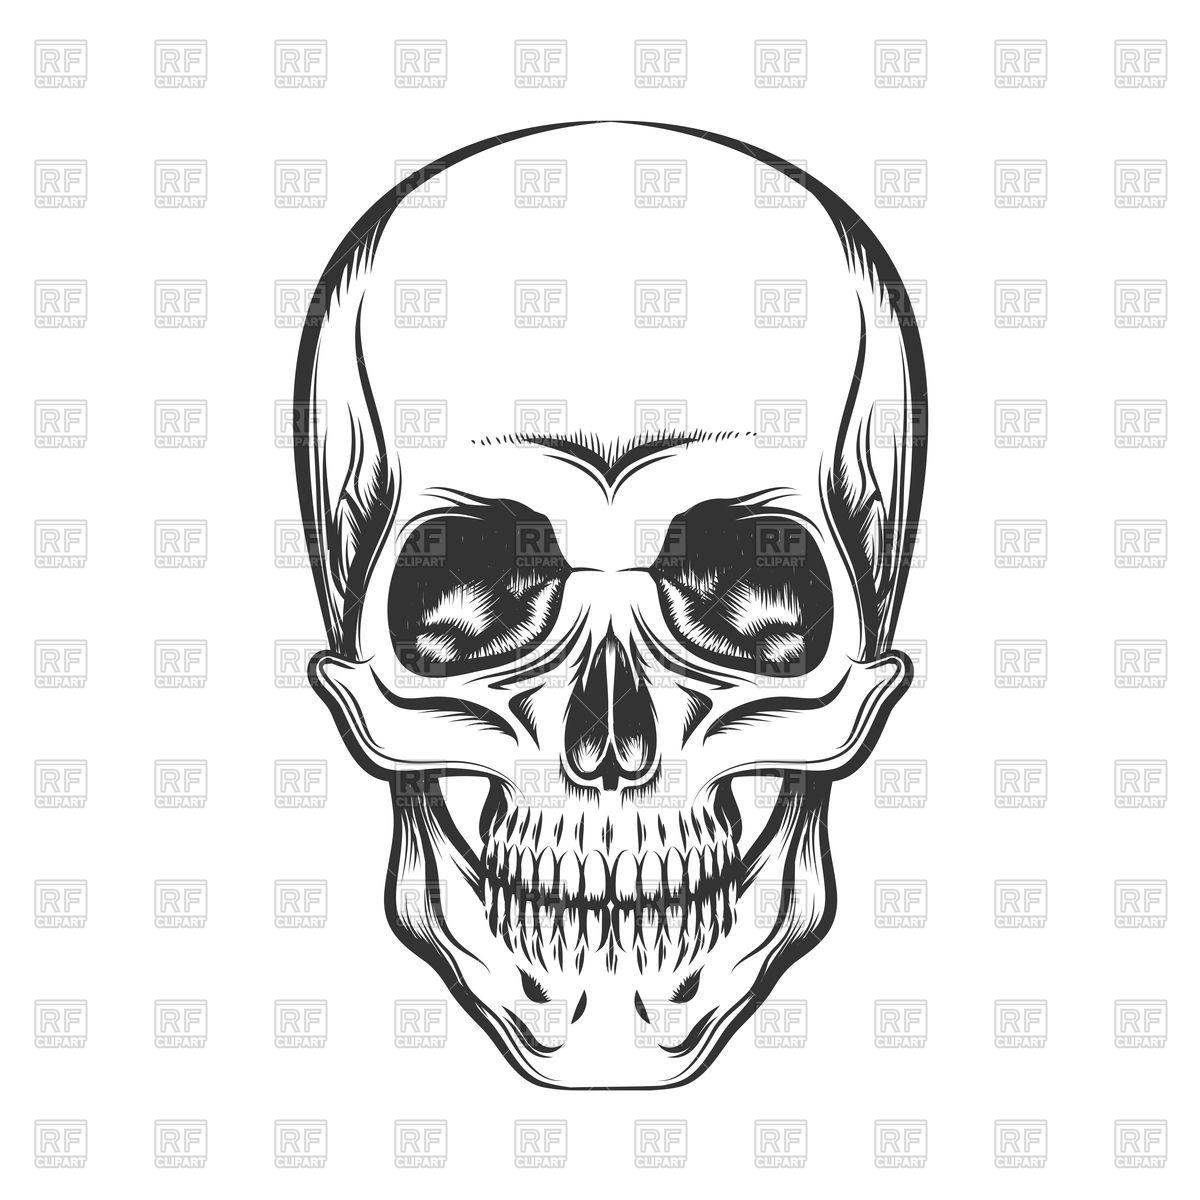 Black and white human skull Stock Vector Image.